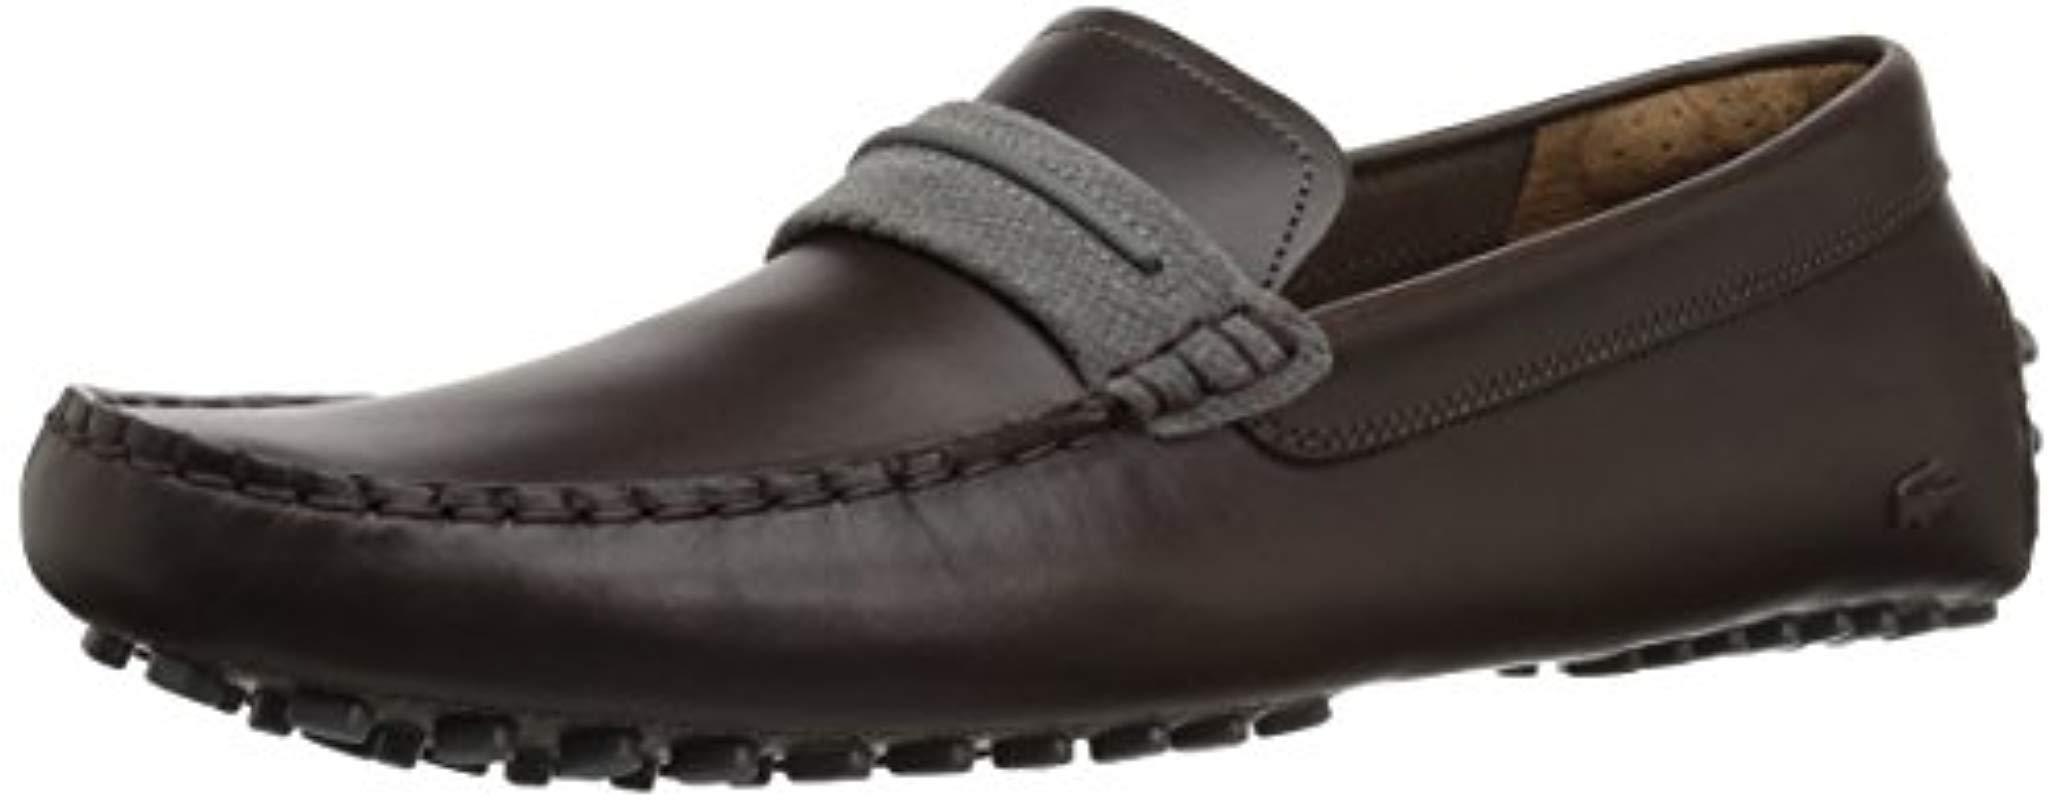 f33e534196bc46 Lyst - Lacoste Herron 317 1 Sneaker in Brown for Men